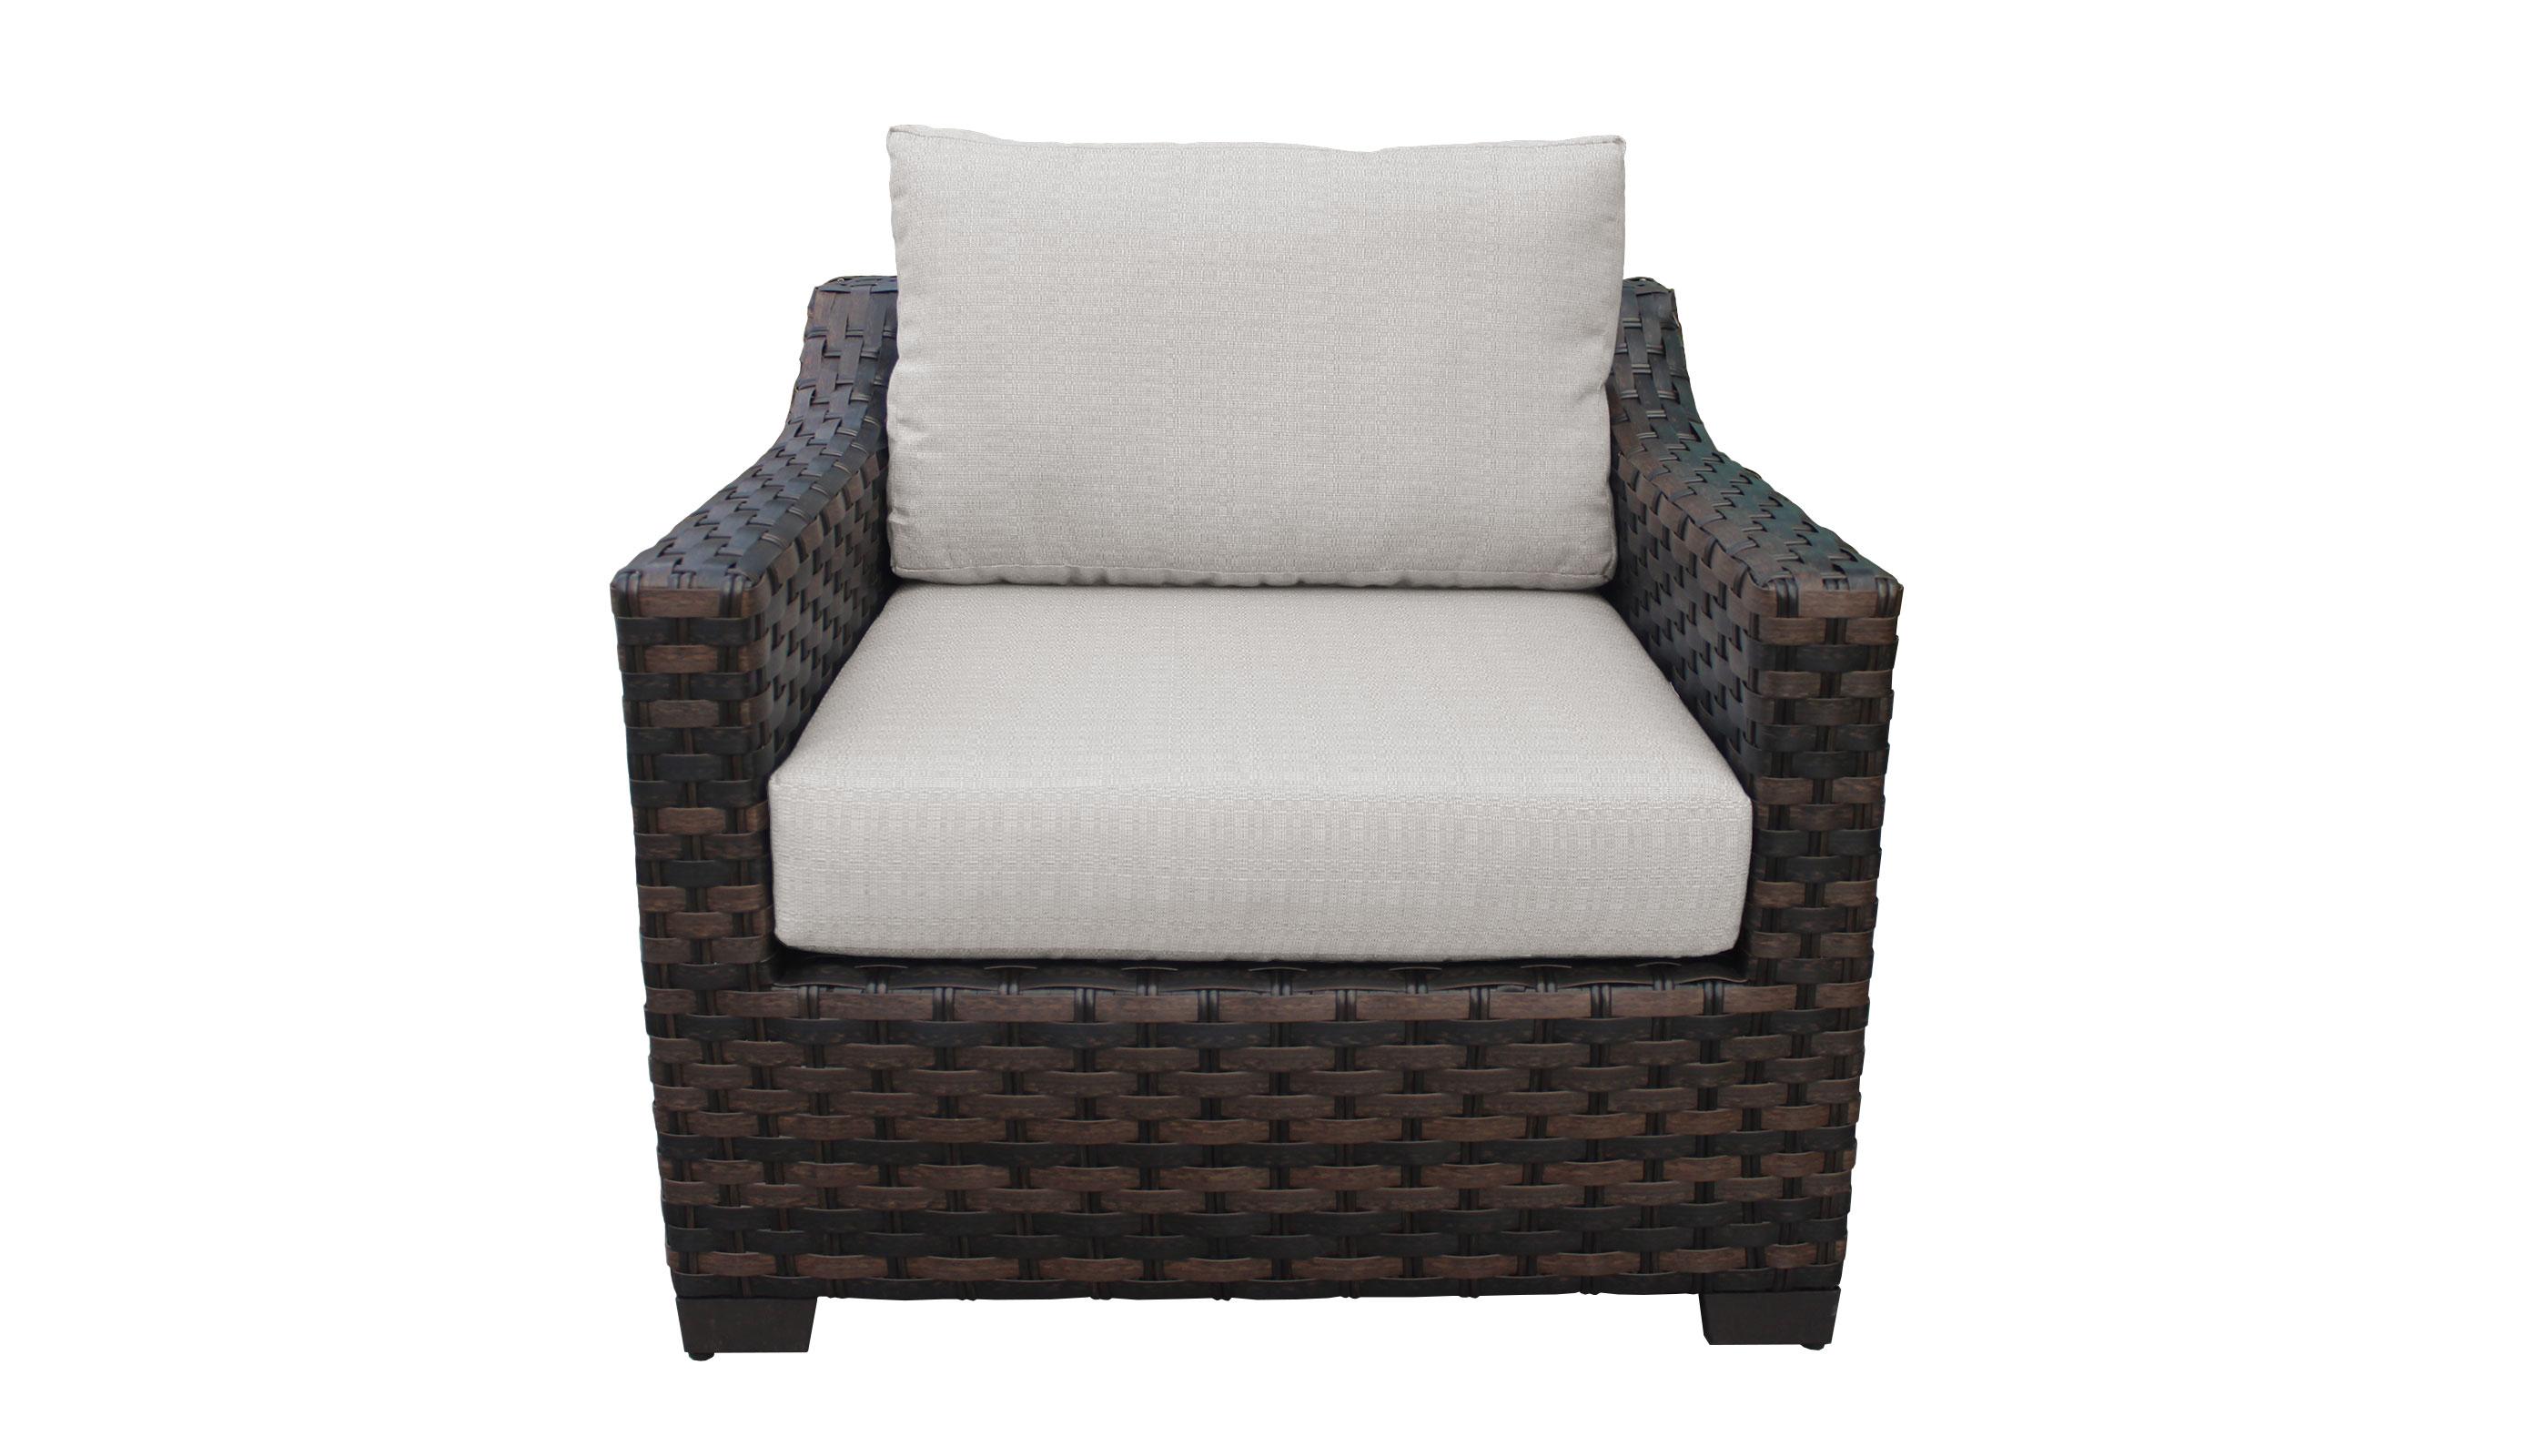 River Brook 2 Piece Outdoor Wicker Patio Furniture Set 02b - TK Classics